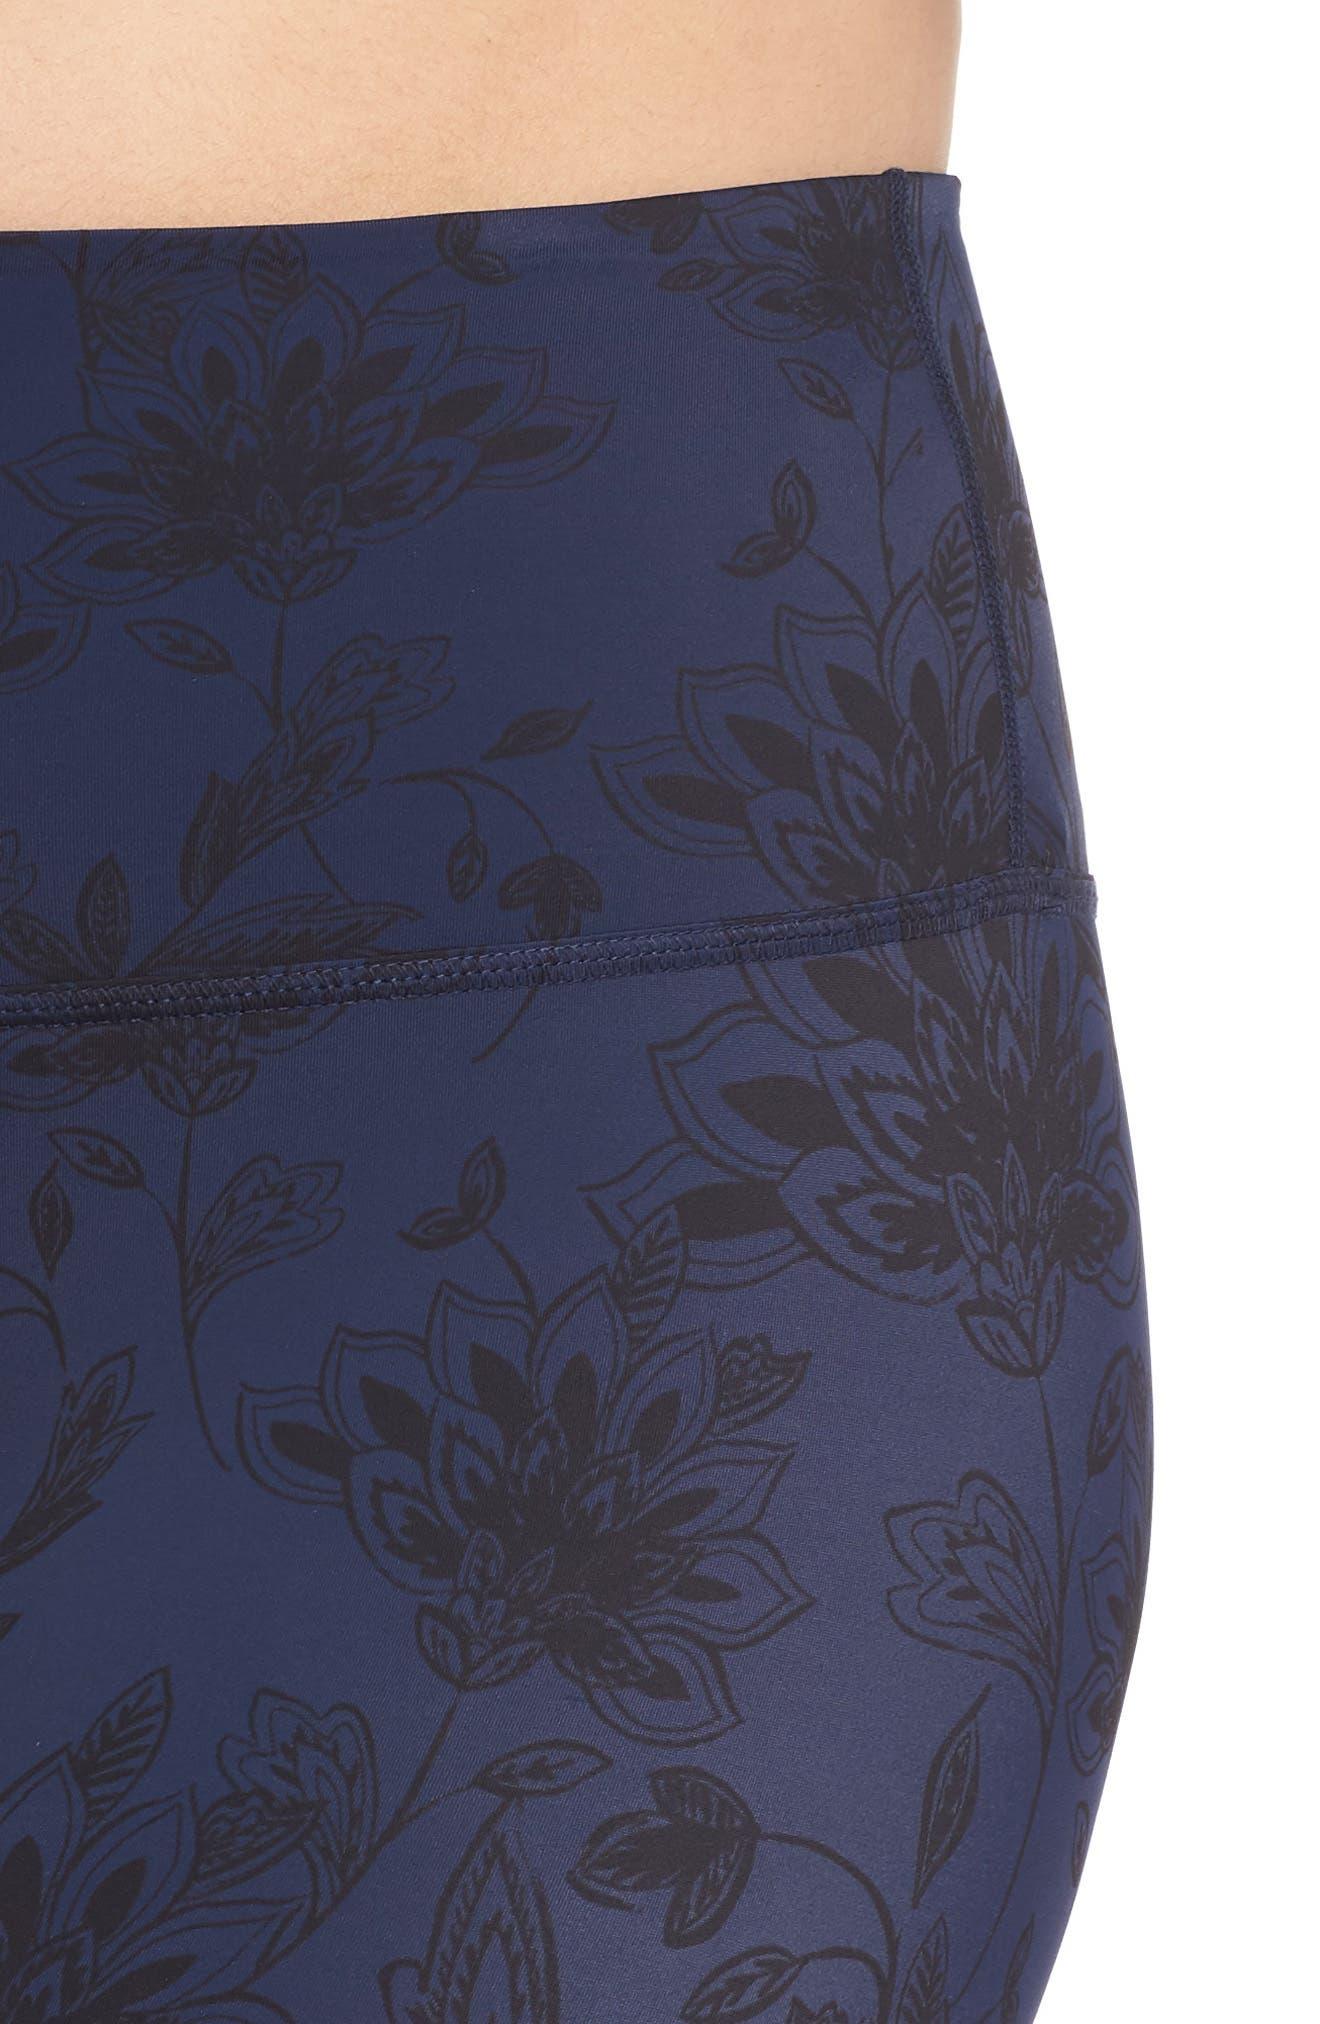 Compression High Waist BOPO Midi Leggings,                             Alternate thumbnail 4, color,                             DESERT FLORAL